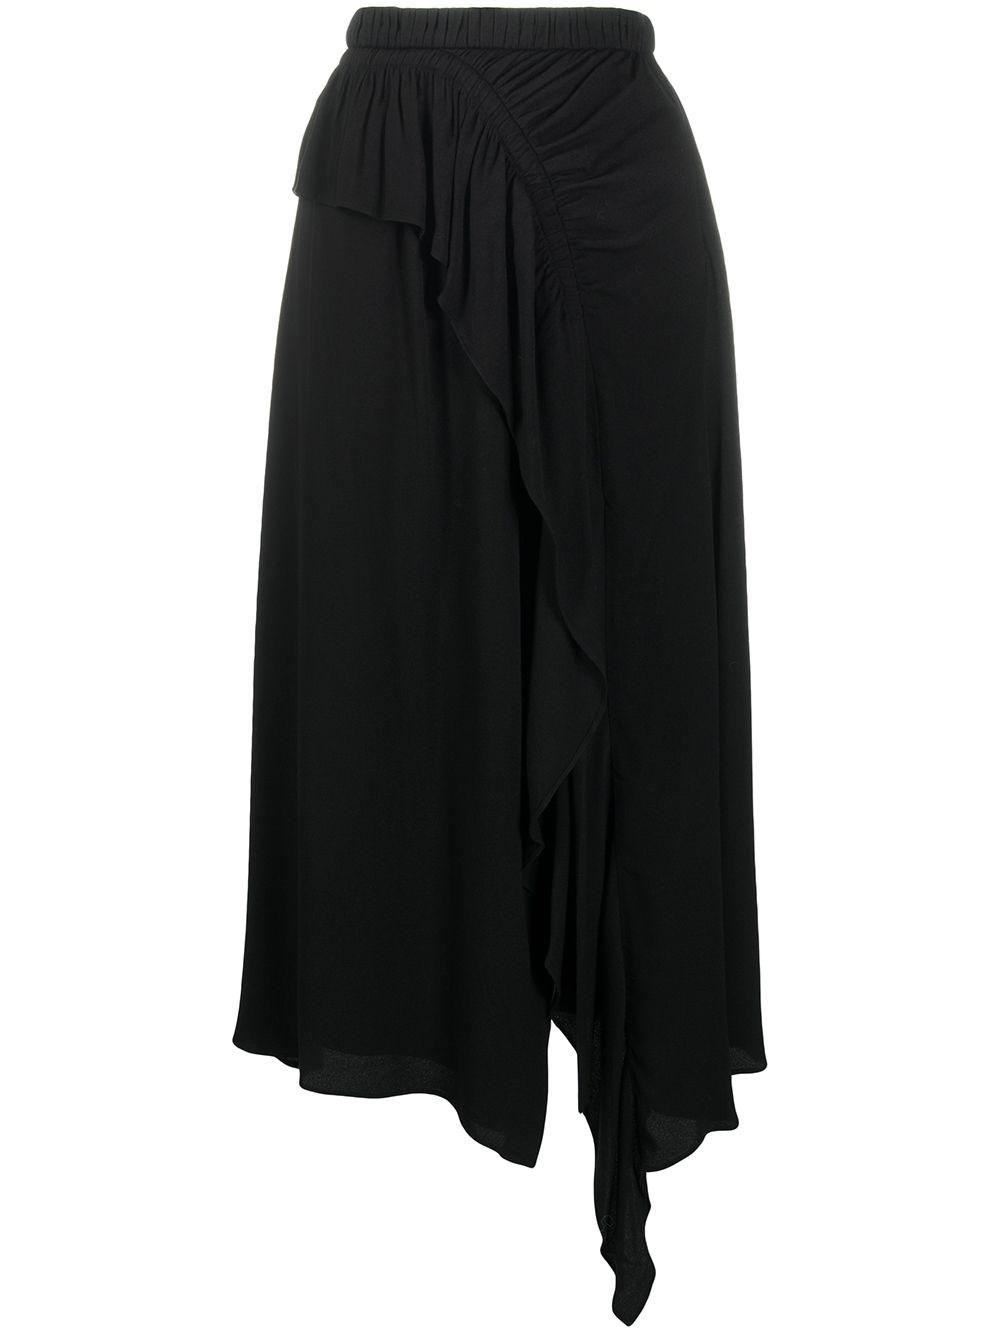 ULLA JOHNSON Asymmetric Midi Skirt